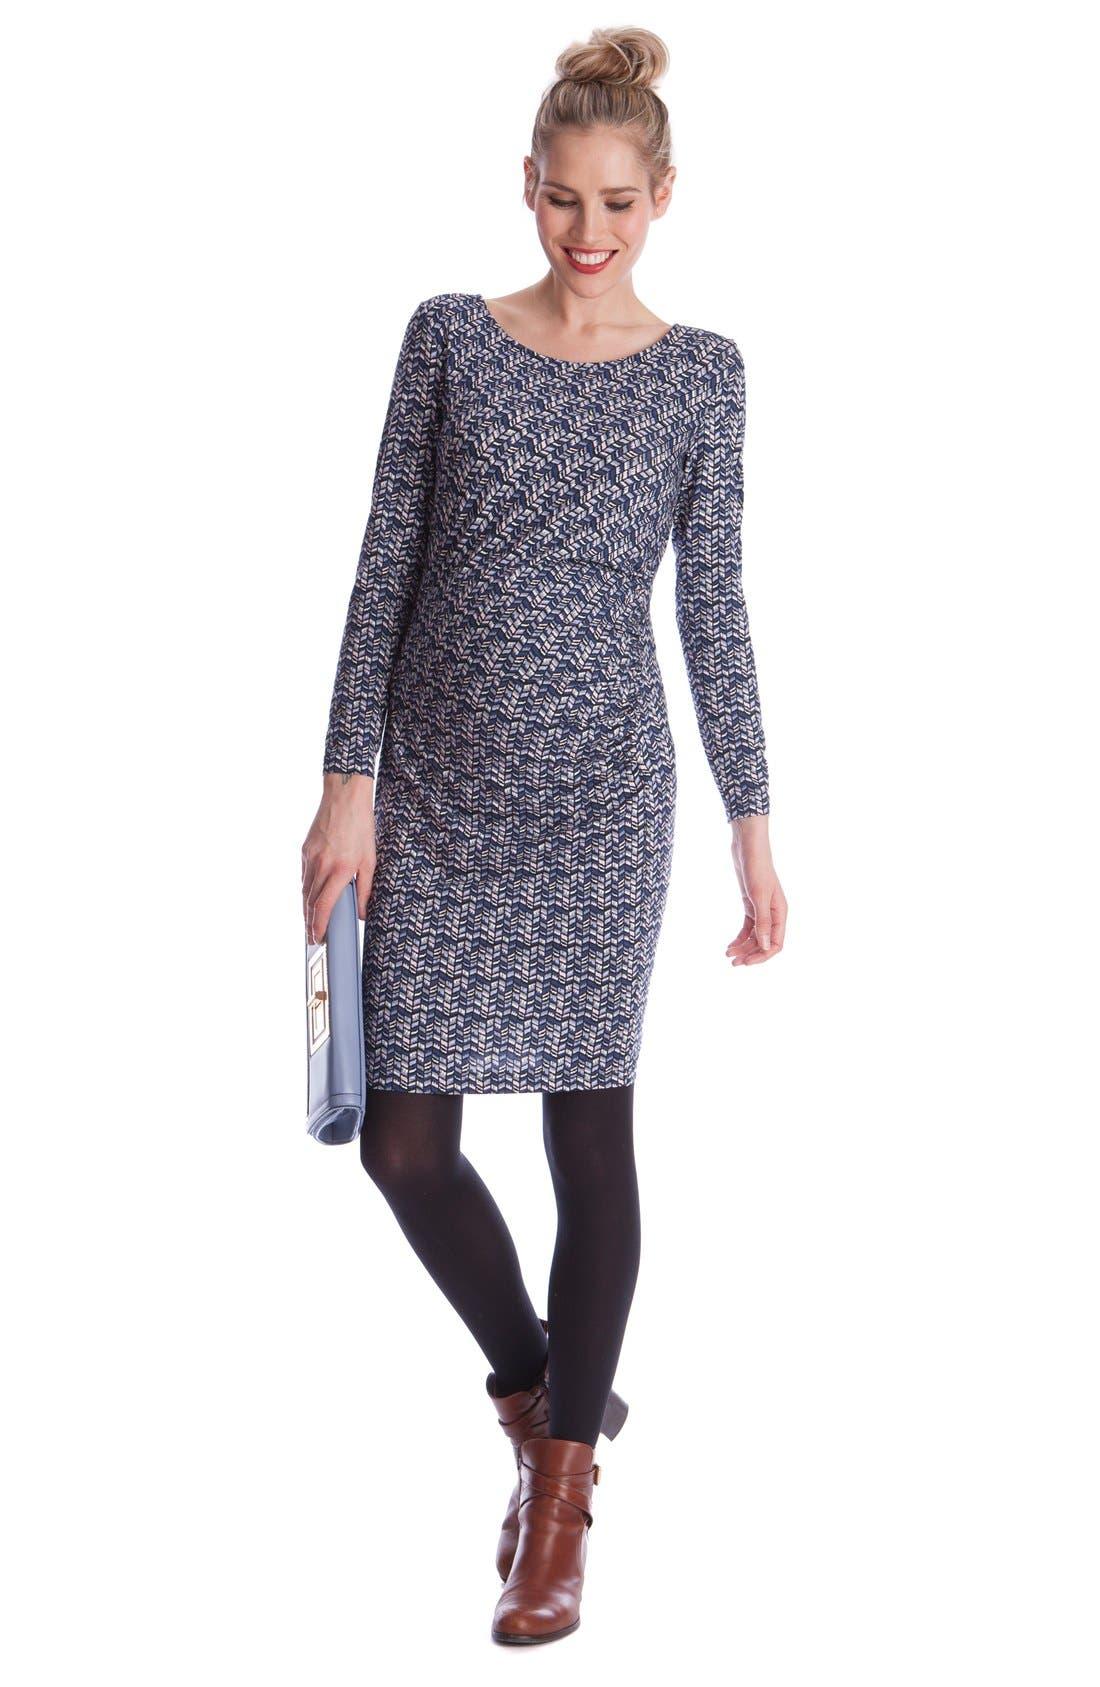 Seraphine 'Cassie' Ruched Chevron Print Maternity Dress